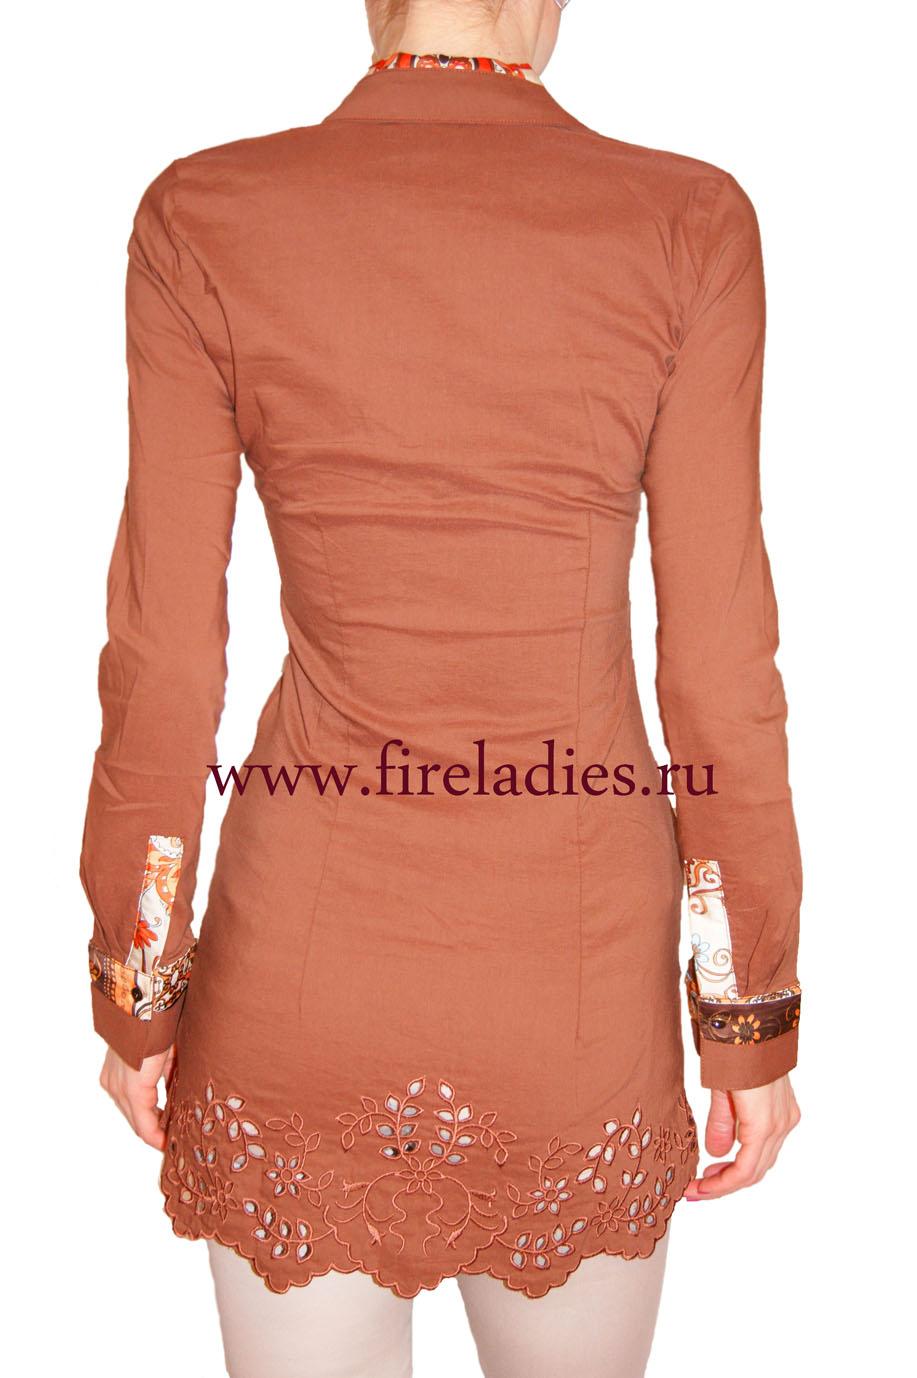 Блузки женские каталог доставка